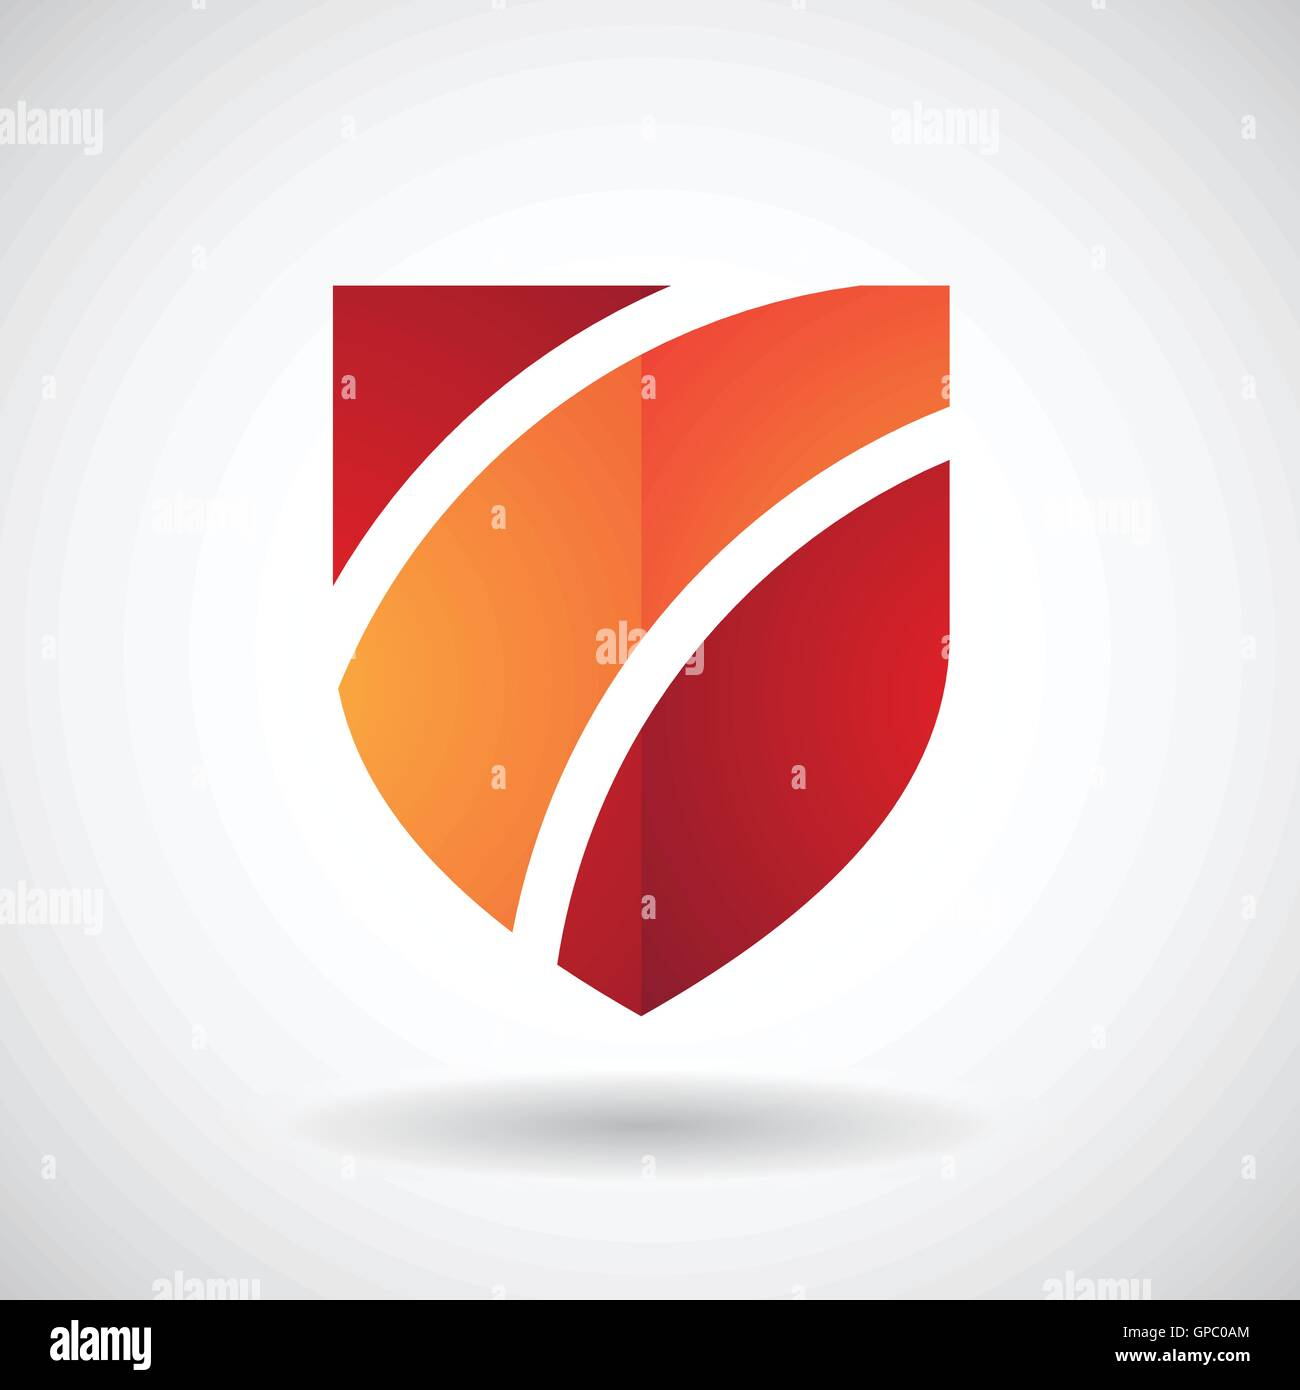 Security Shield Logo Template Design Stock Photos & Security Shield ...